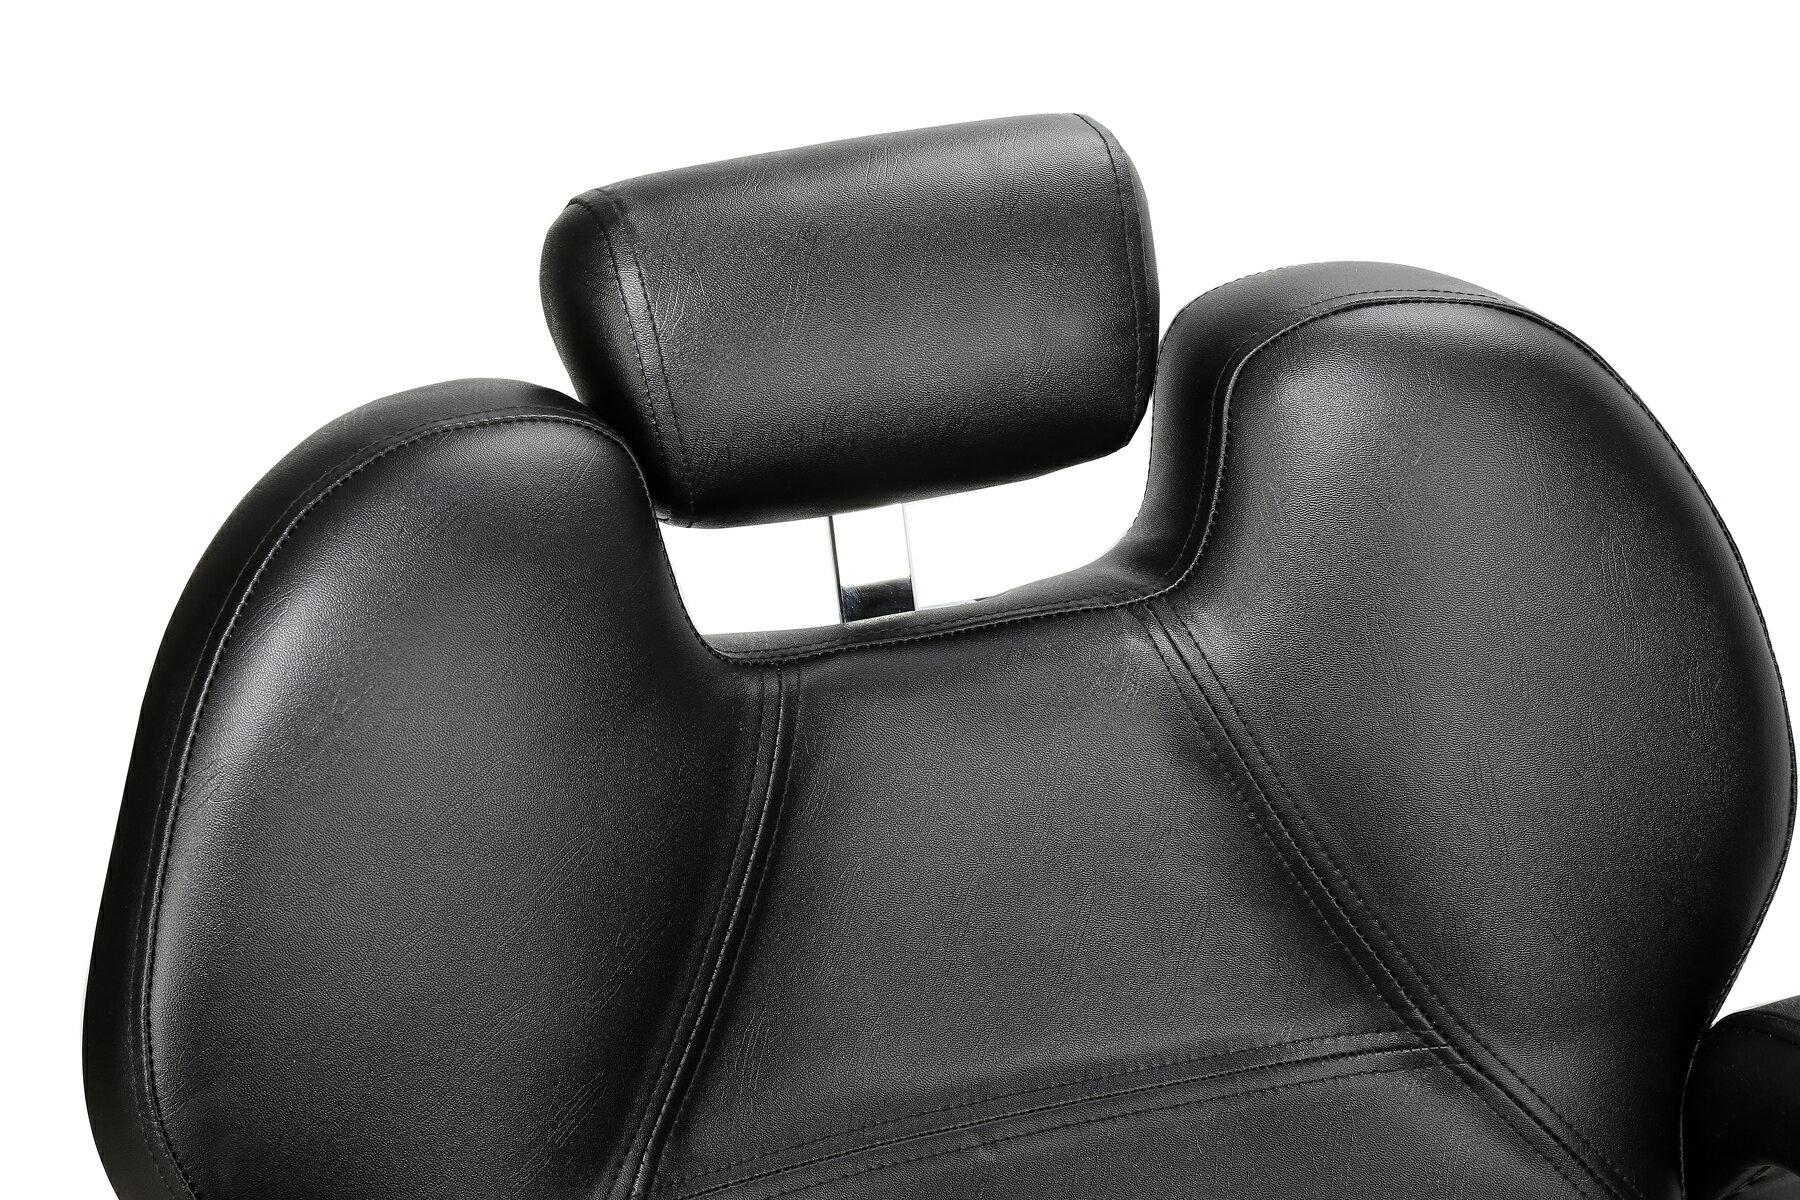 BarberPub All Purpose Hydraulic Recline Salon Beauty Spa Styling Barber Chair Black 4